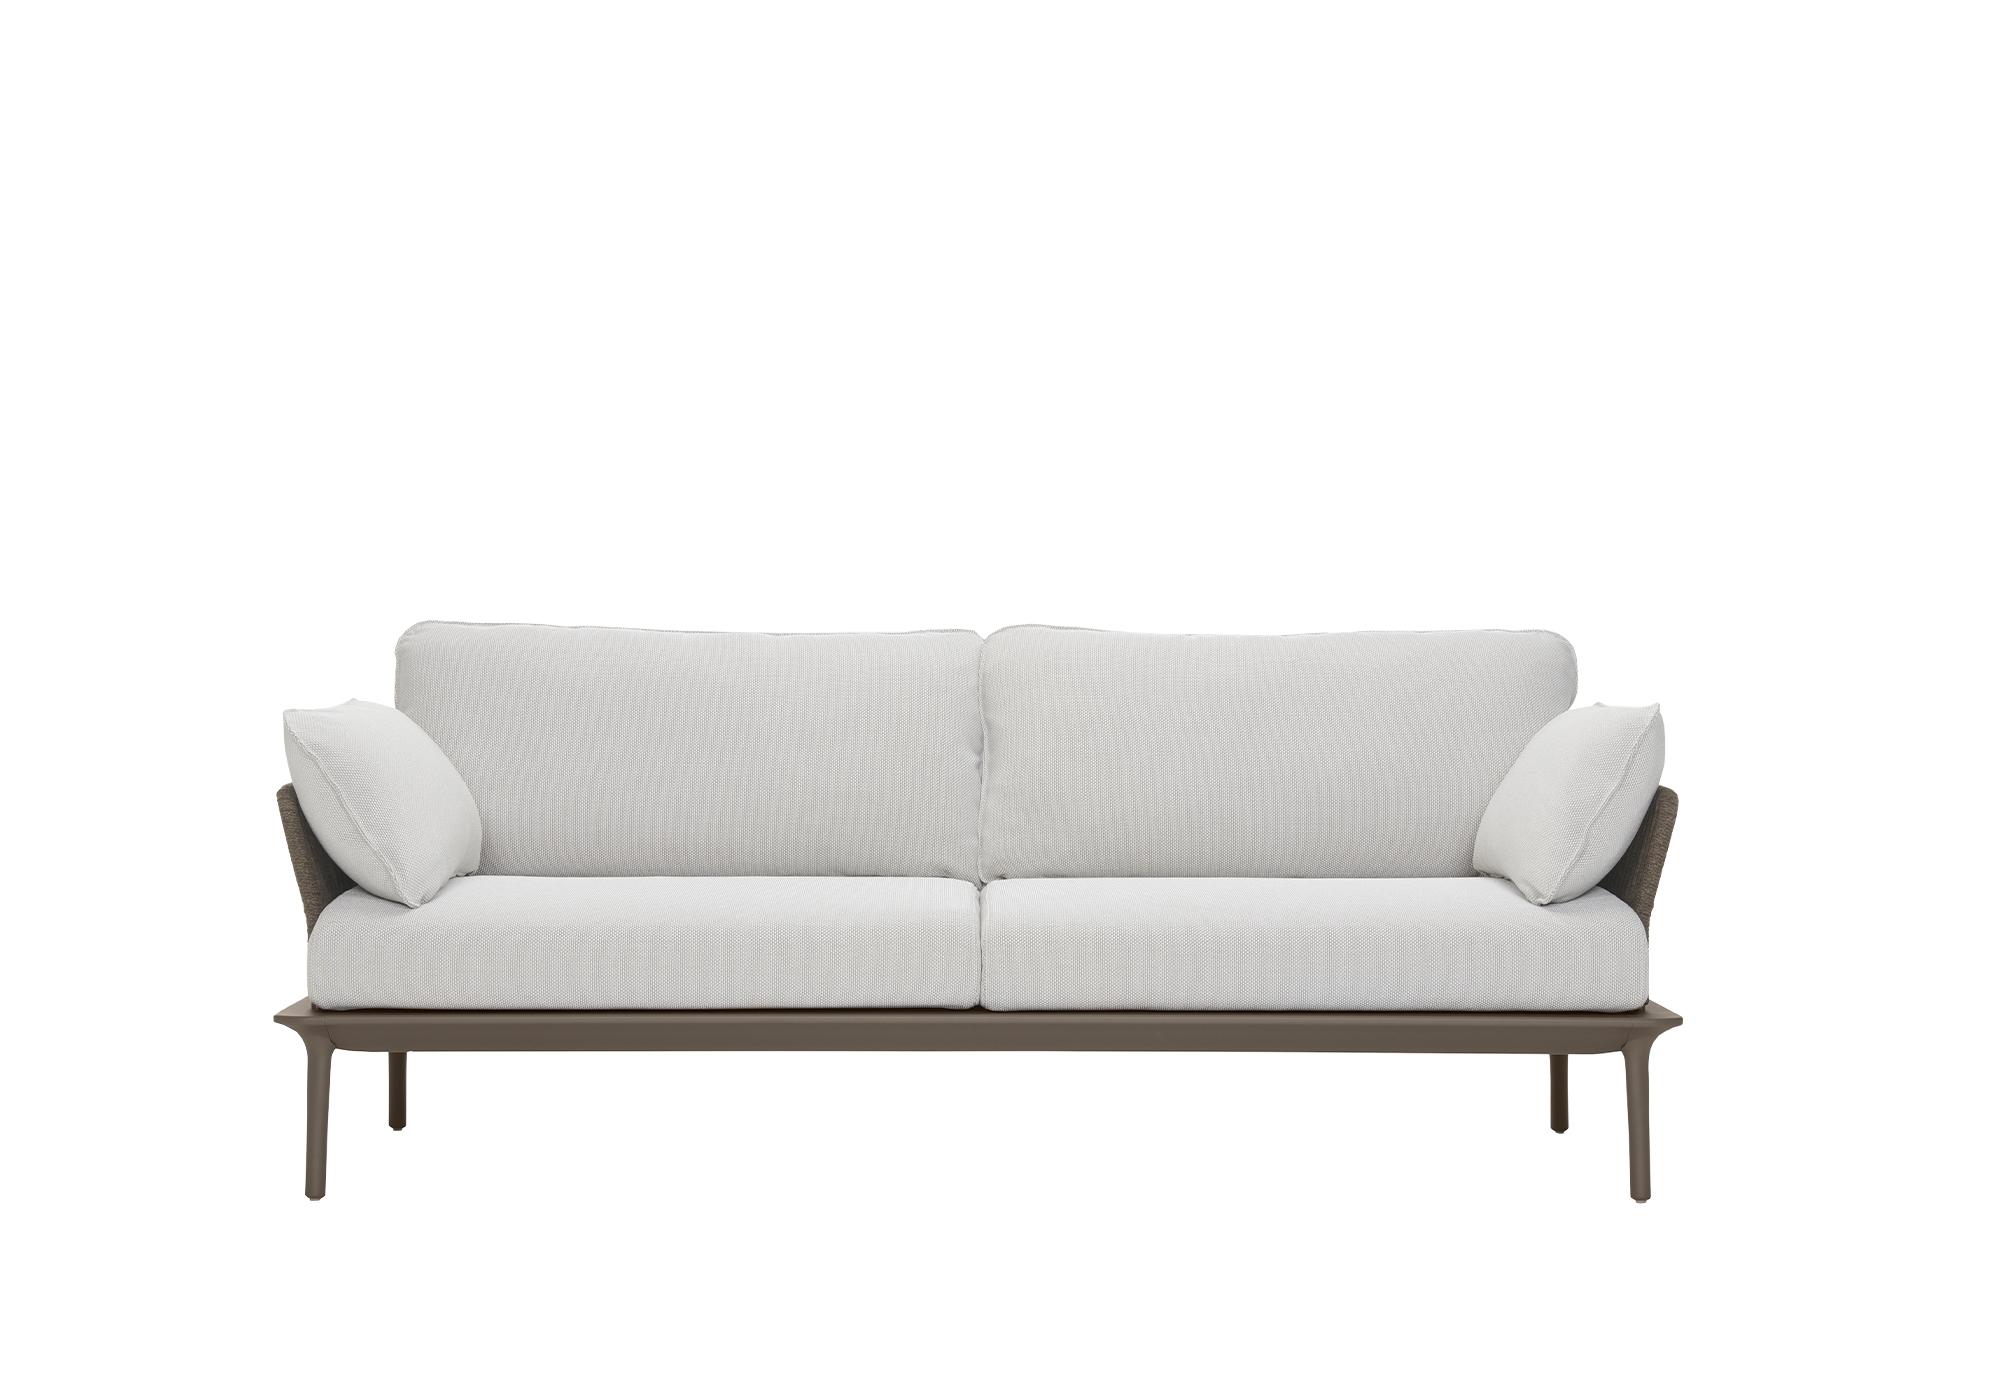 Pedrali Reva Twist Lounge Outdoor Three-Seater Sofa